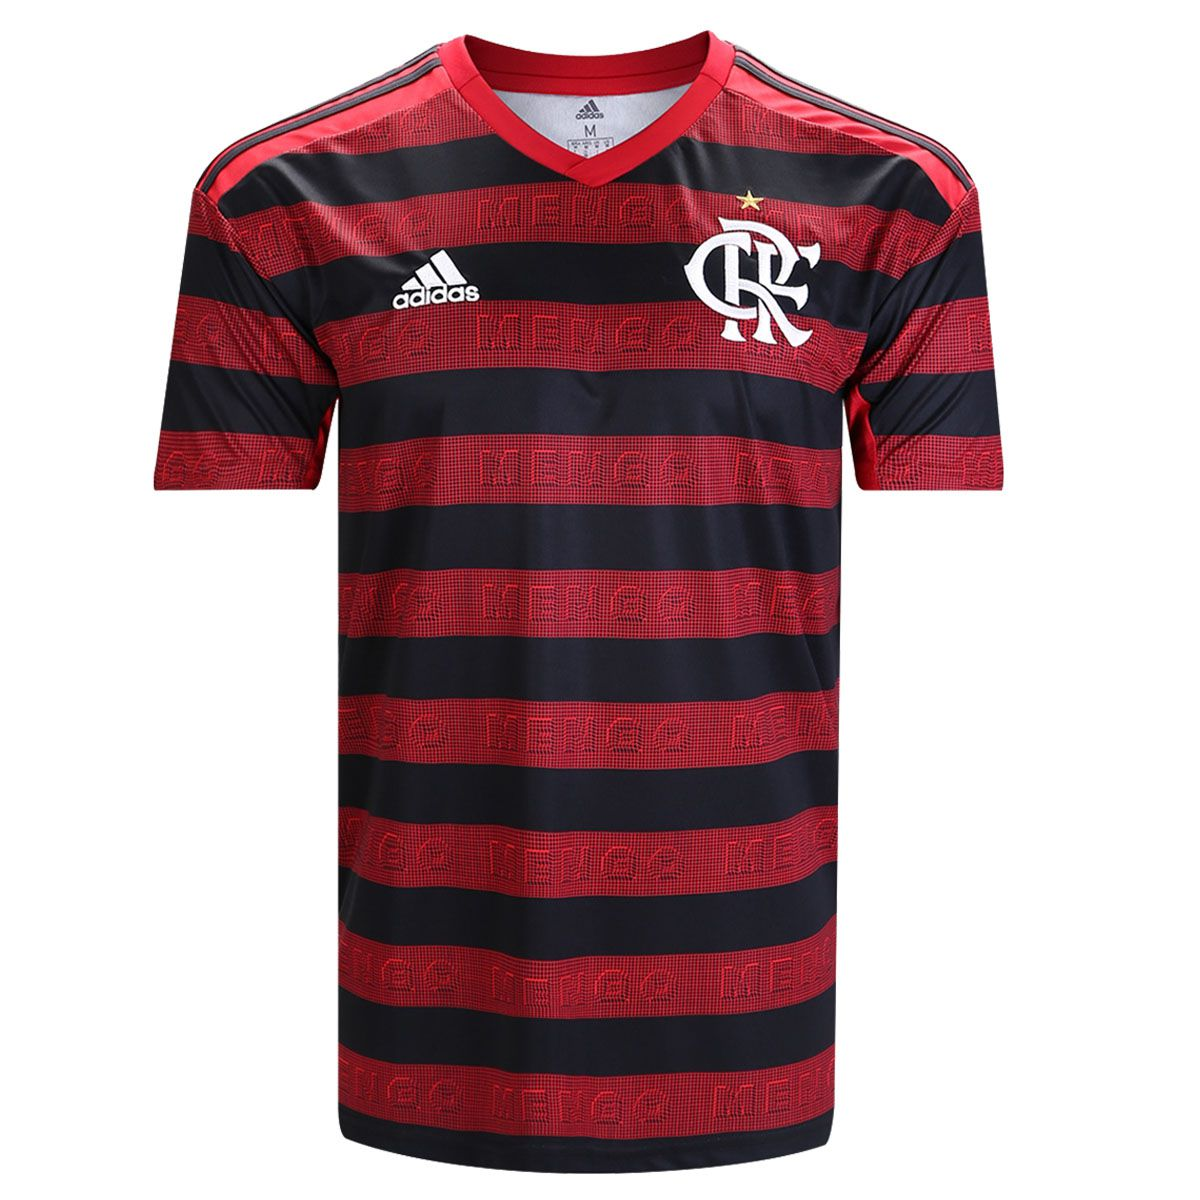 Camisa Flamengo I 19/20 s/n° Torcedor Adidas Masculina